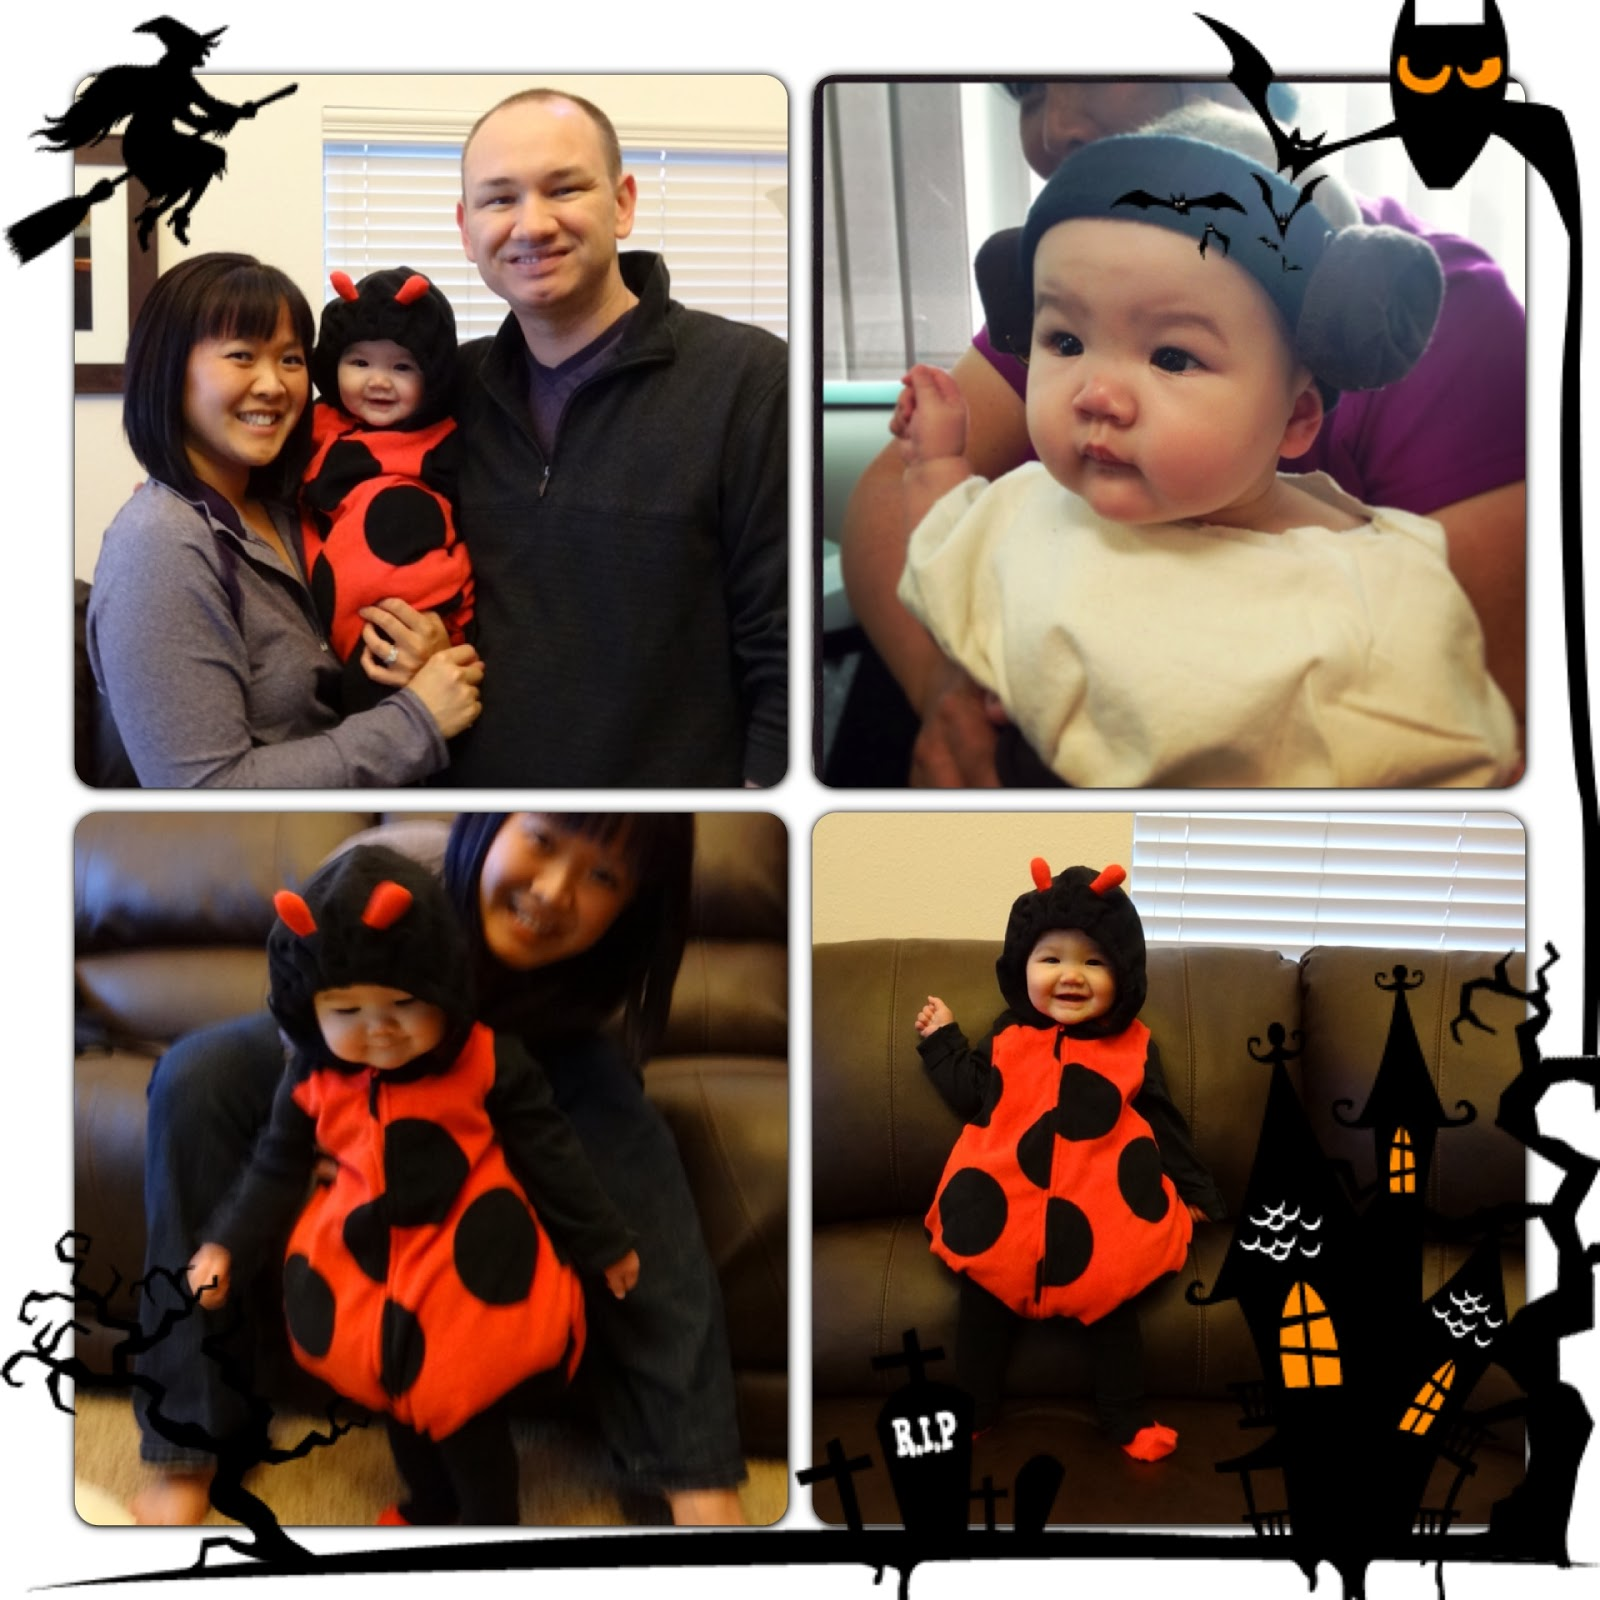 Princess Leia ladybug baby costume